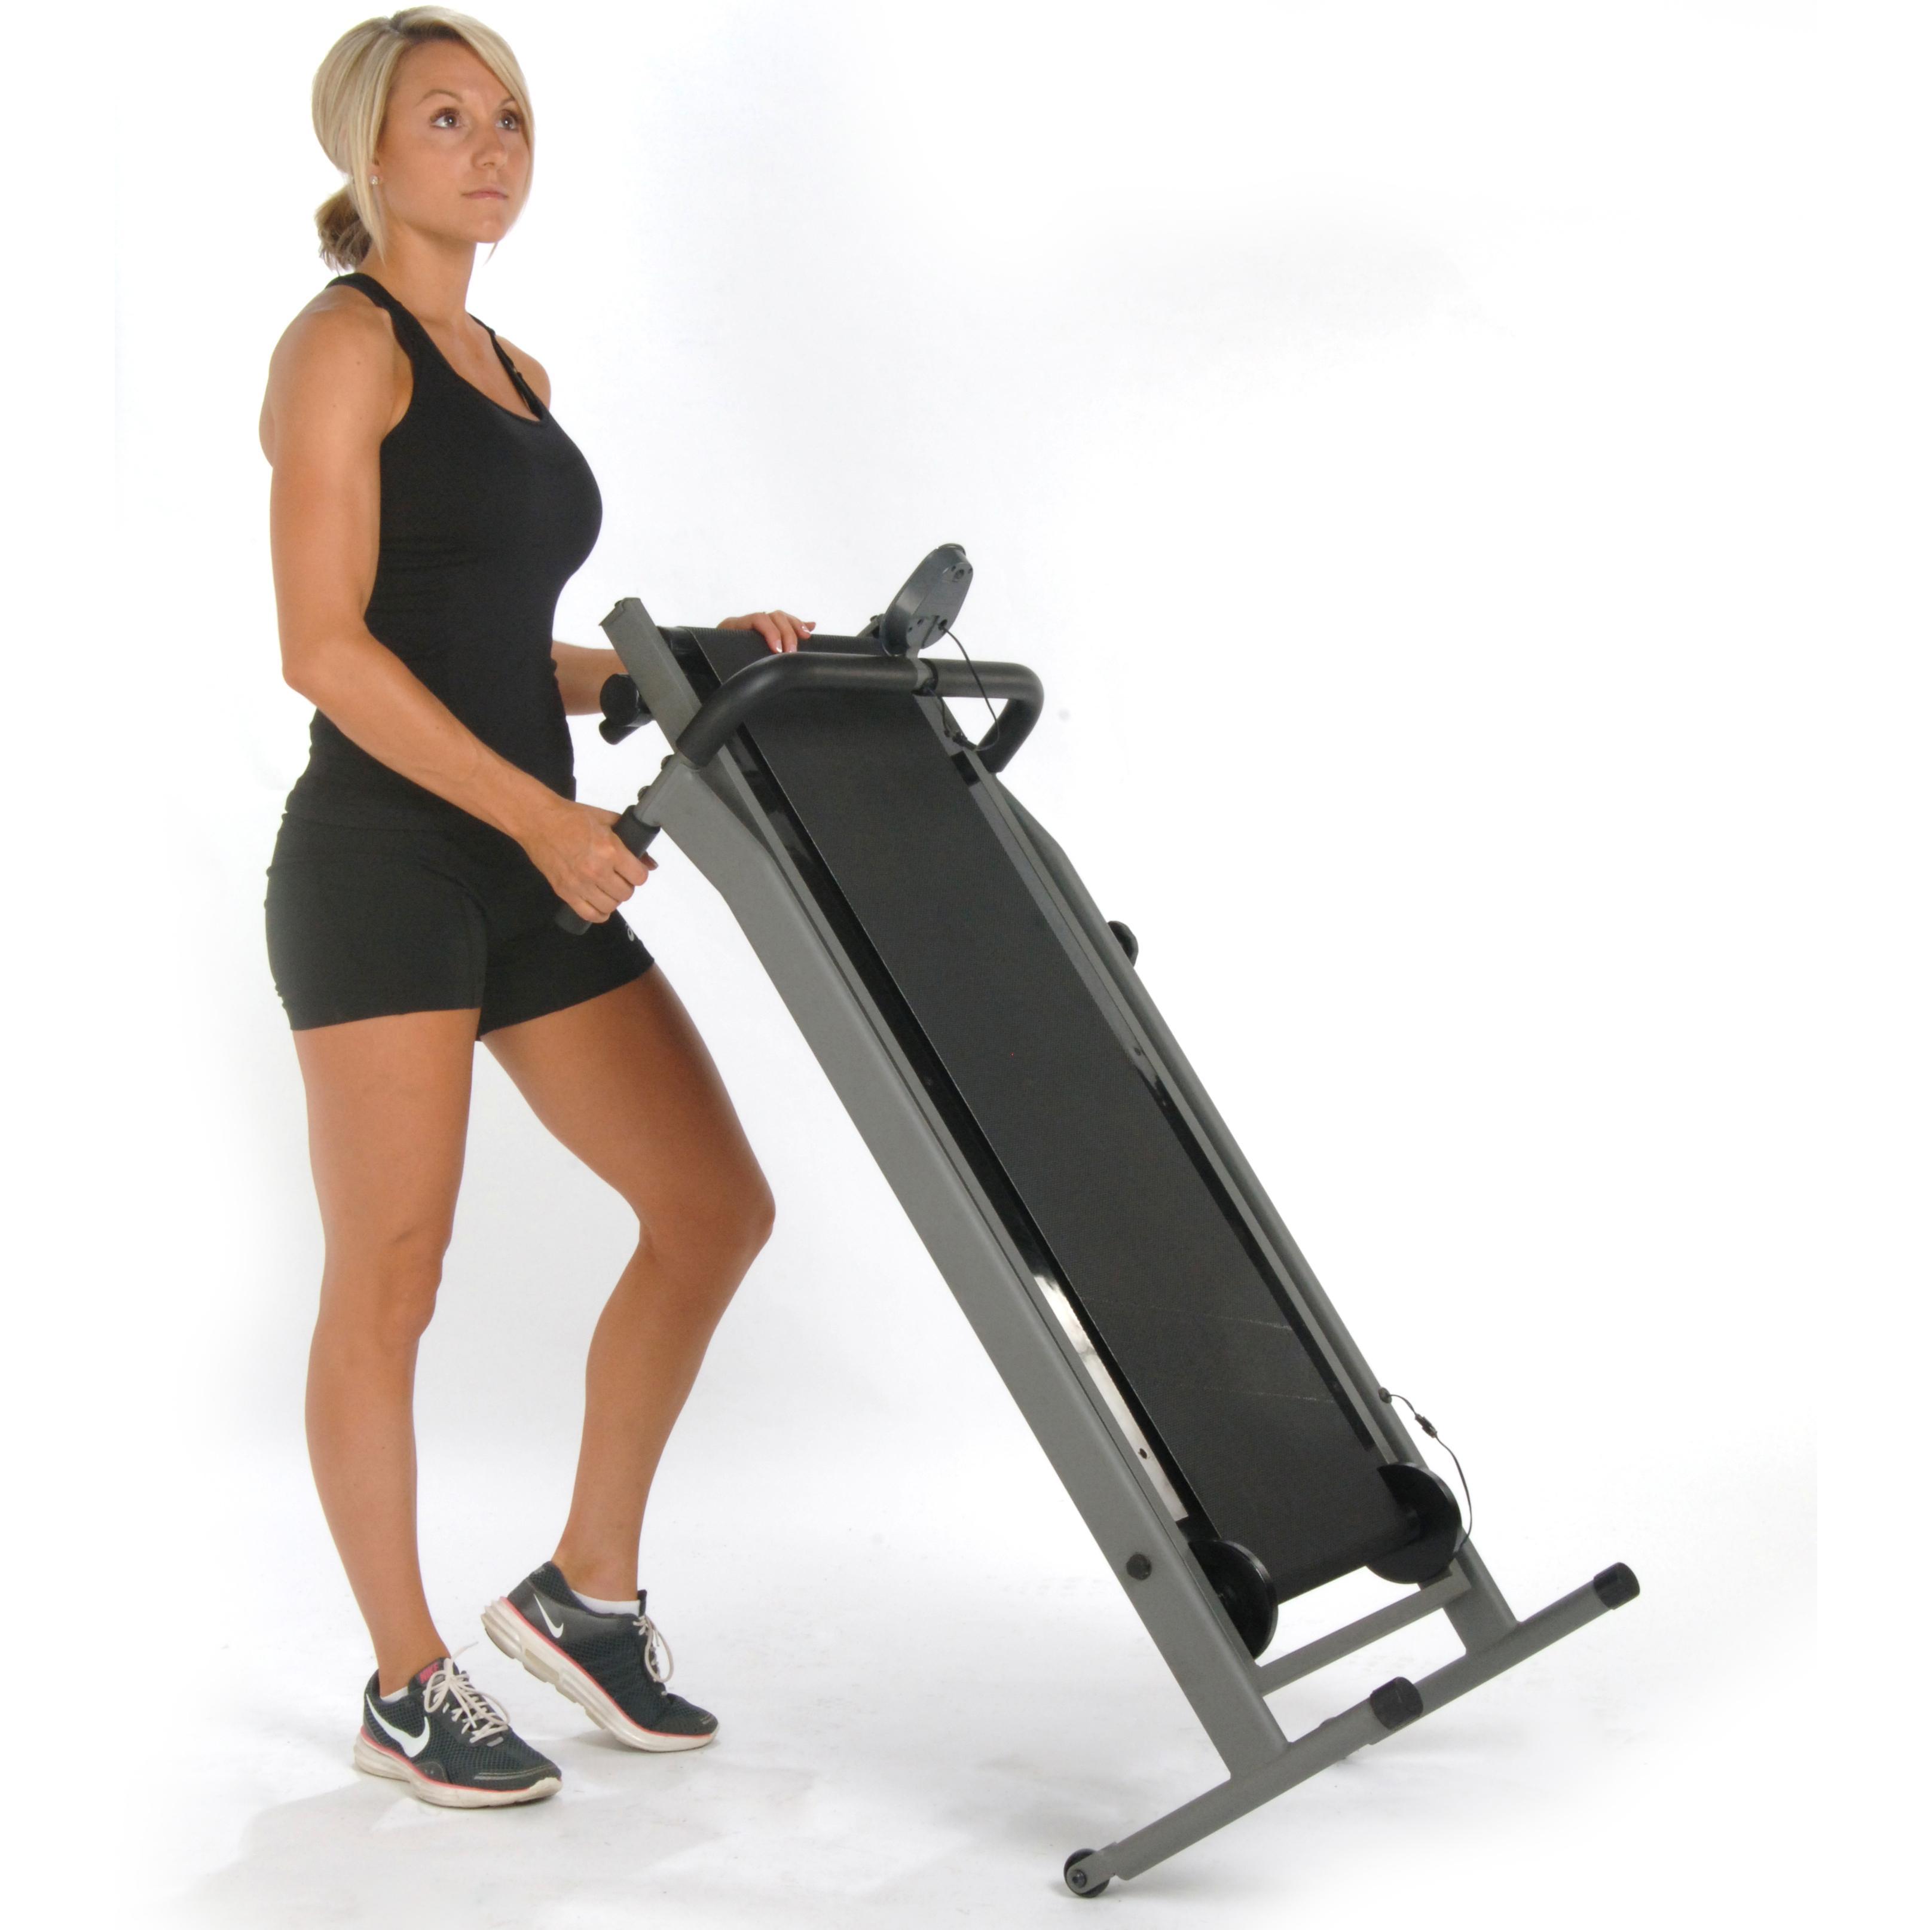 Amazon.com : Stamina Inmotion Manual Treadmill (Pewter